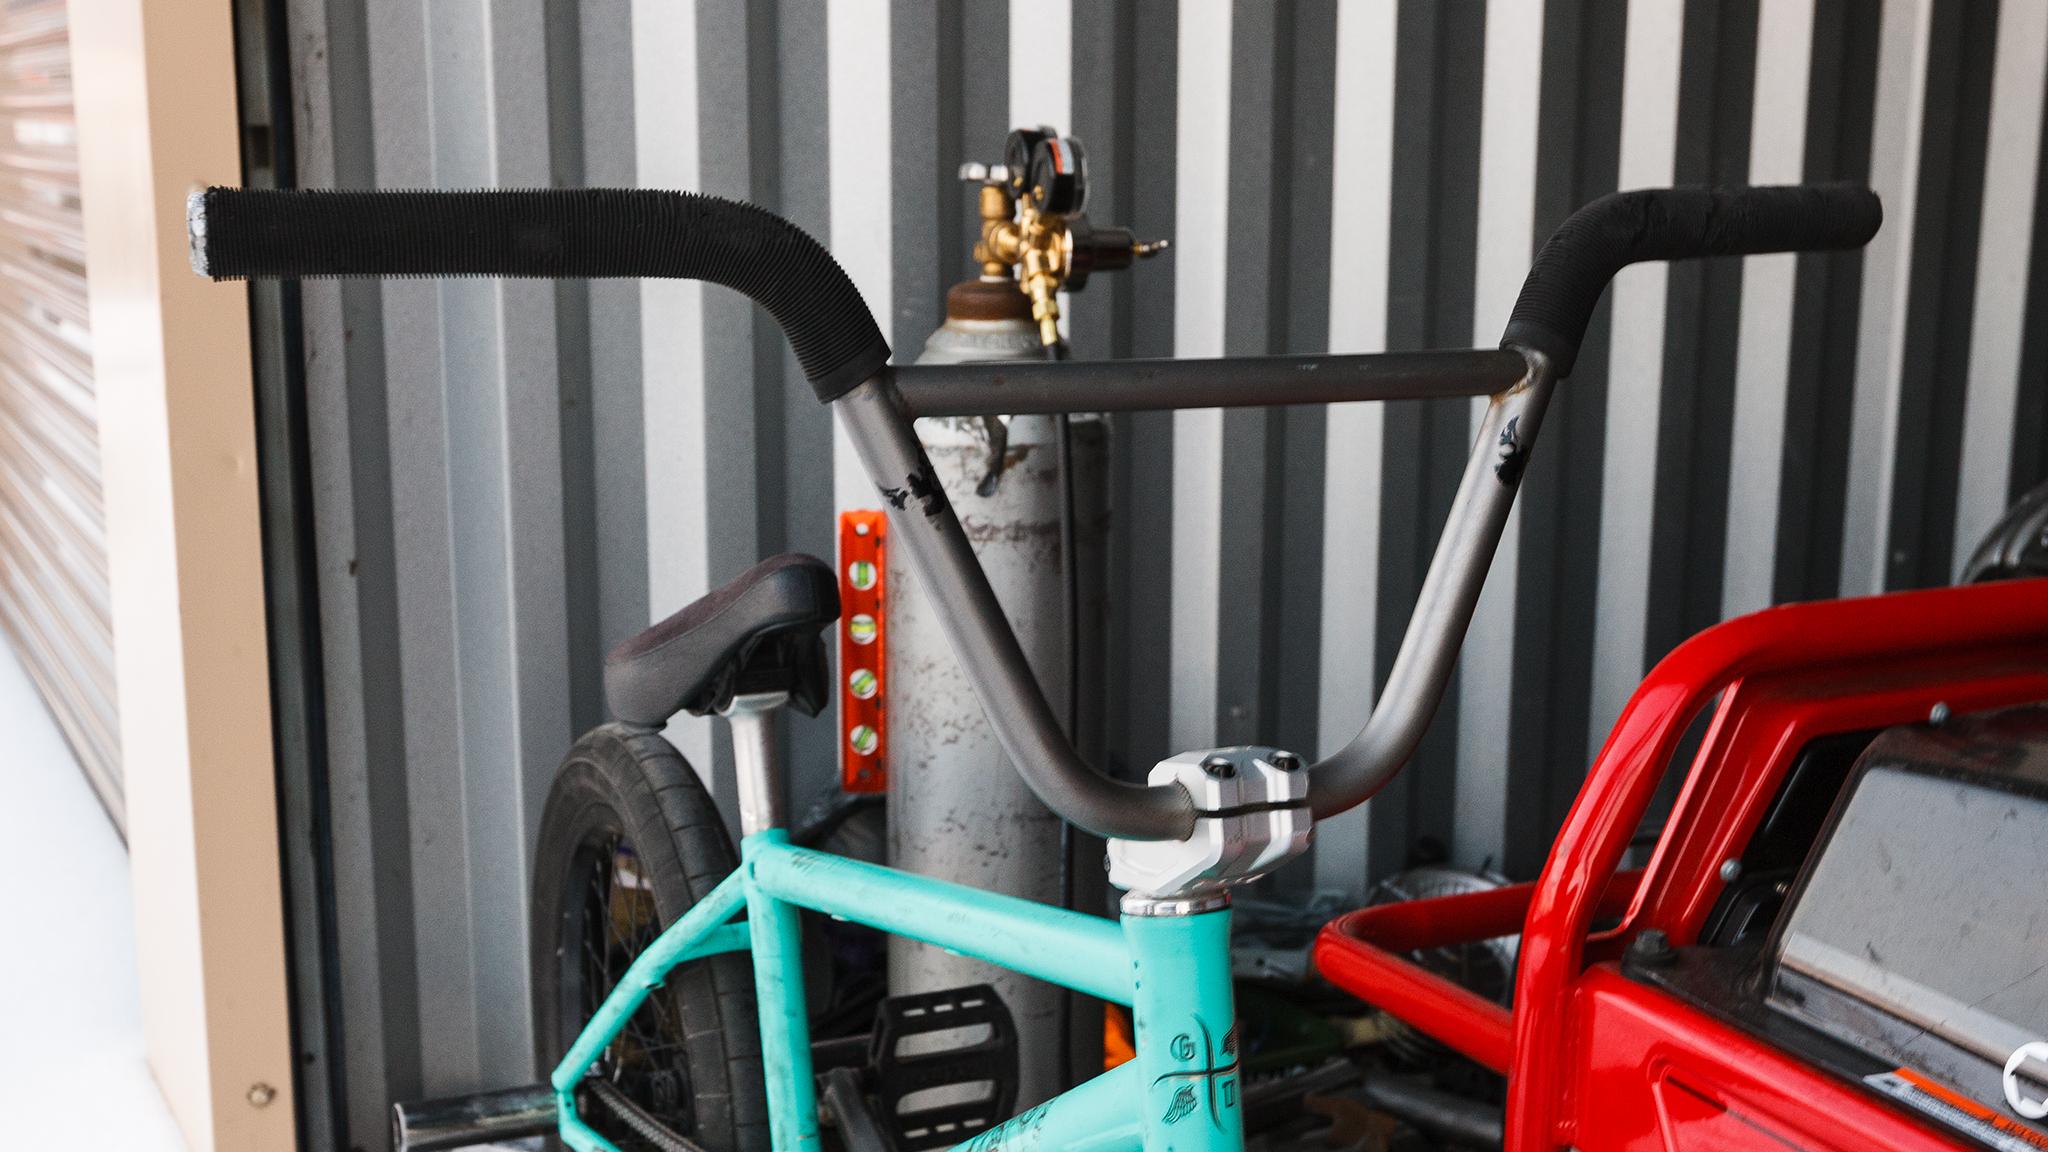 GT handlebars